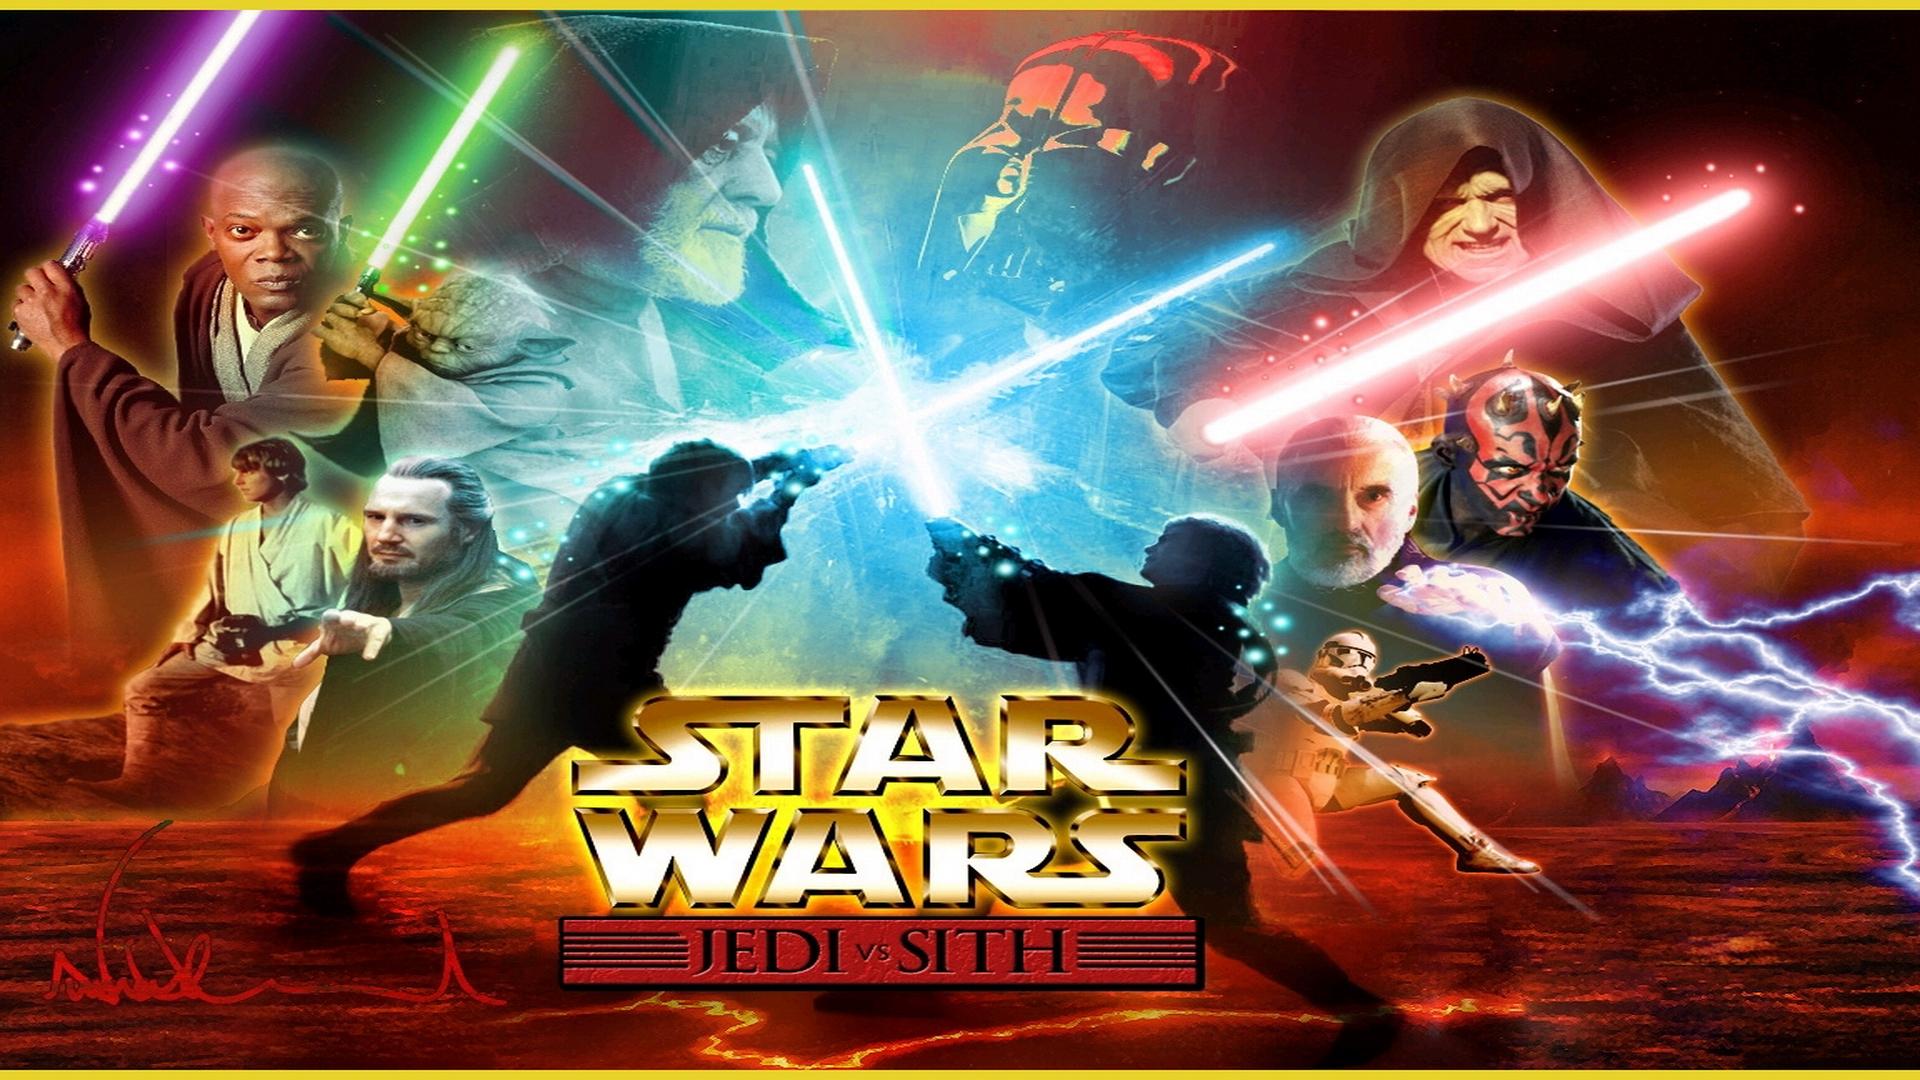 Free Download Star Wars Wallpapers Jedi Vs Sith Star Wars 2912035 1152 864 Desktop 1920x1080 For Your Desktop Mobile Tablet Explore 49 Sith Vs Jedi Wallpaper Star Wars Sith